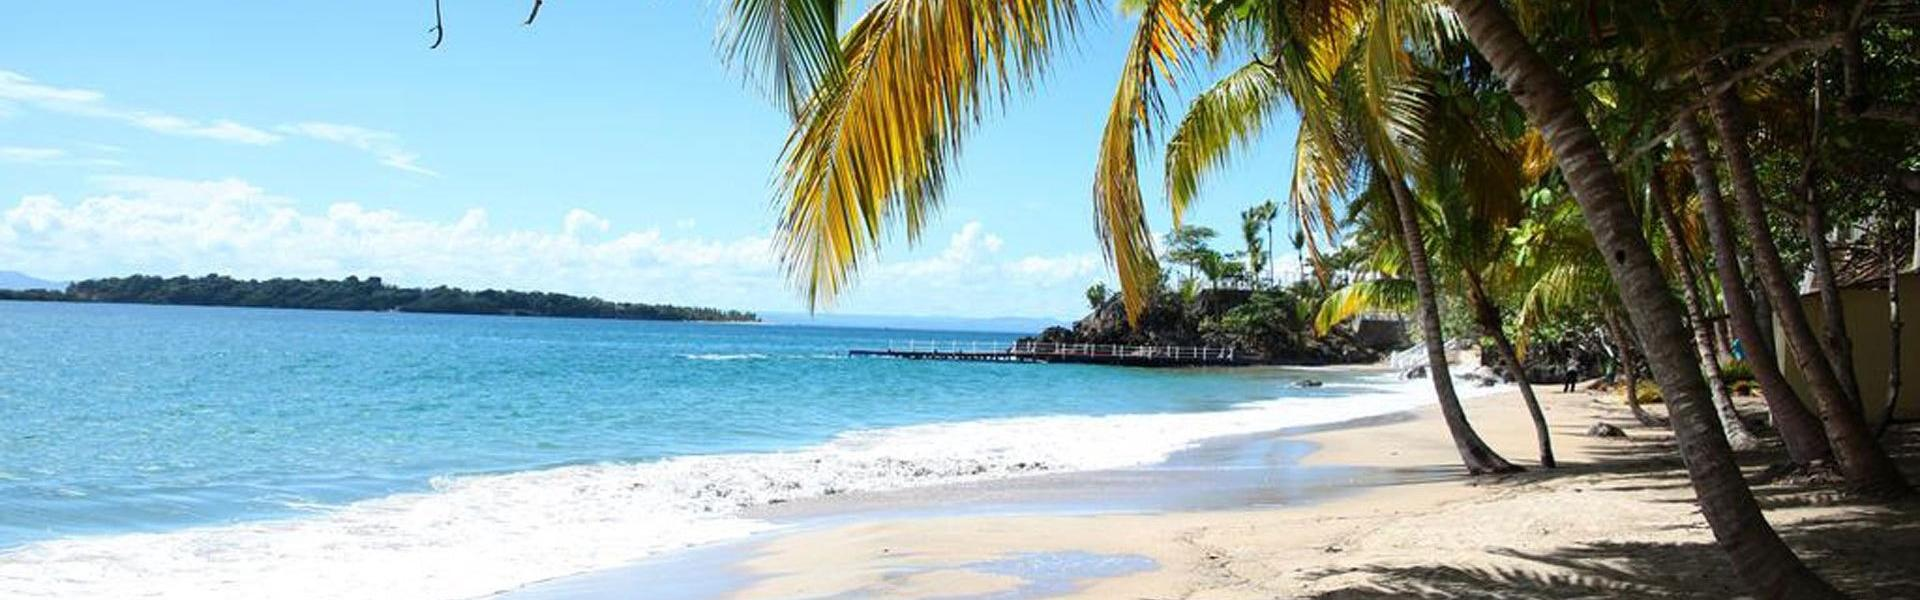 Luxury Bahia Principe Samana (Dominikai utazások)